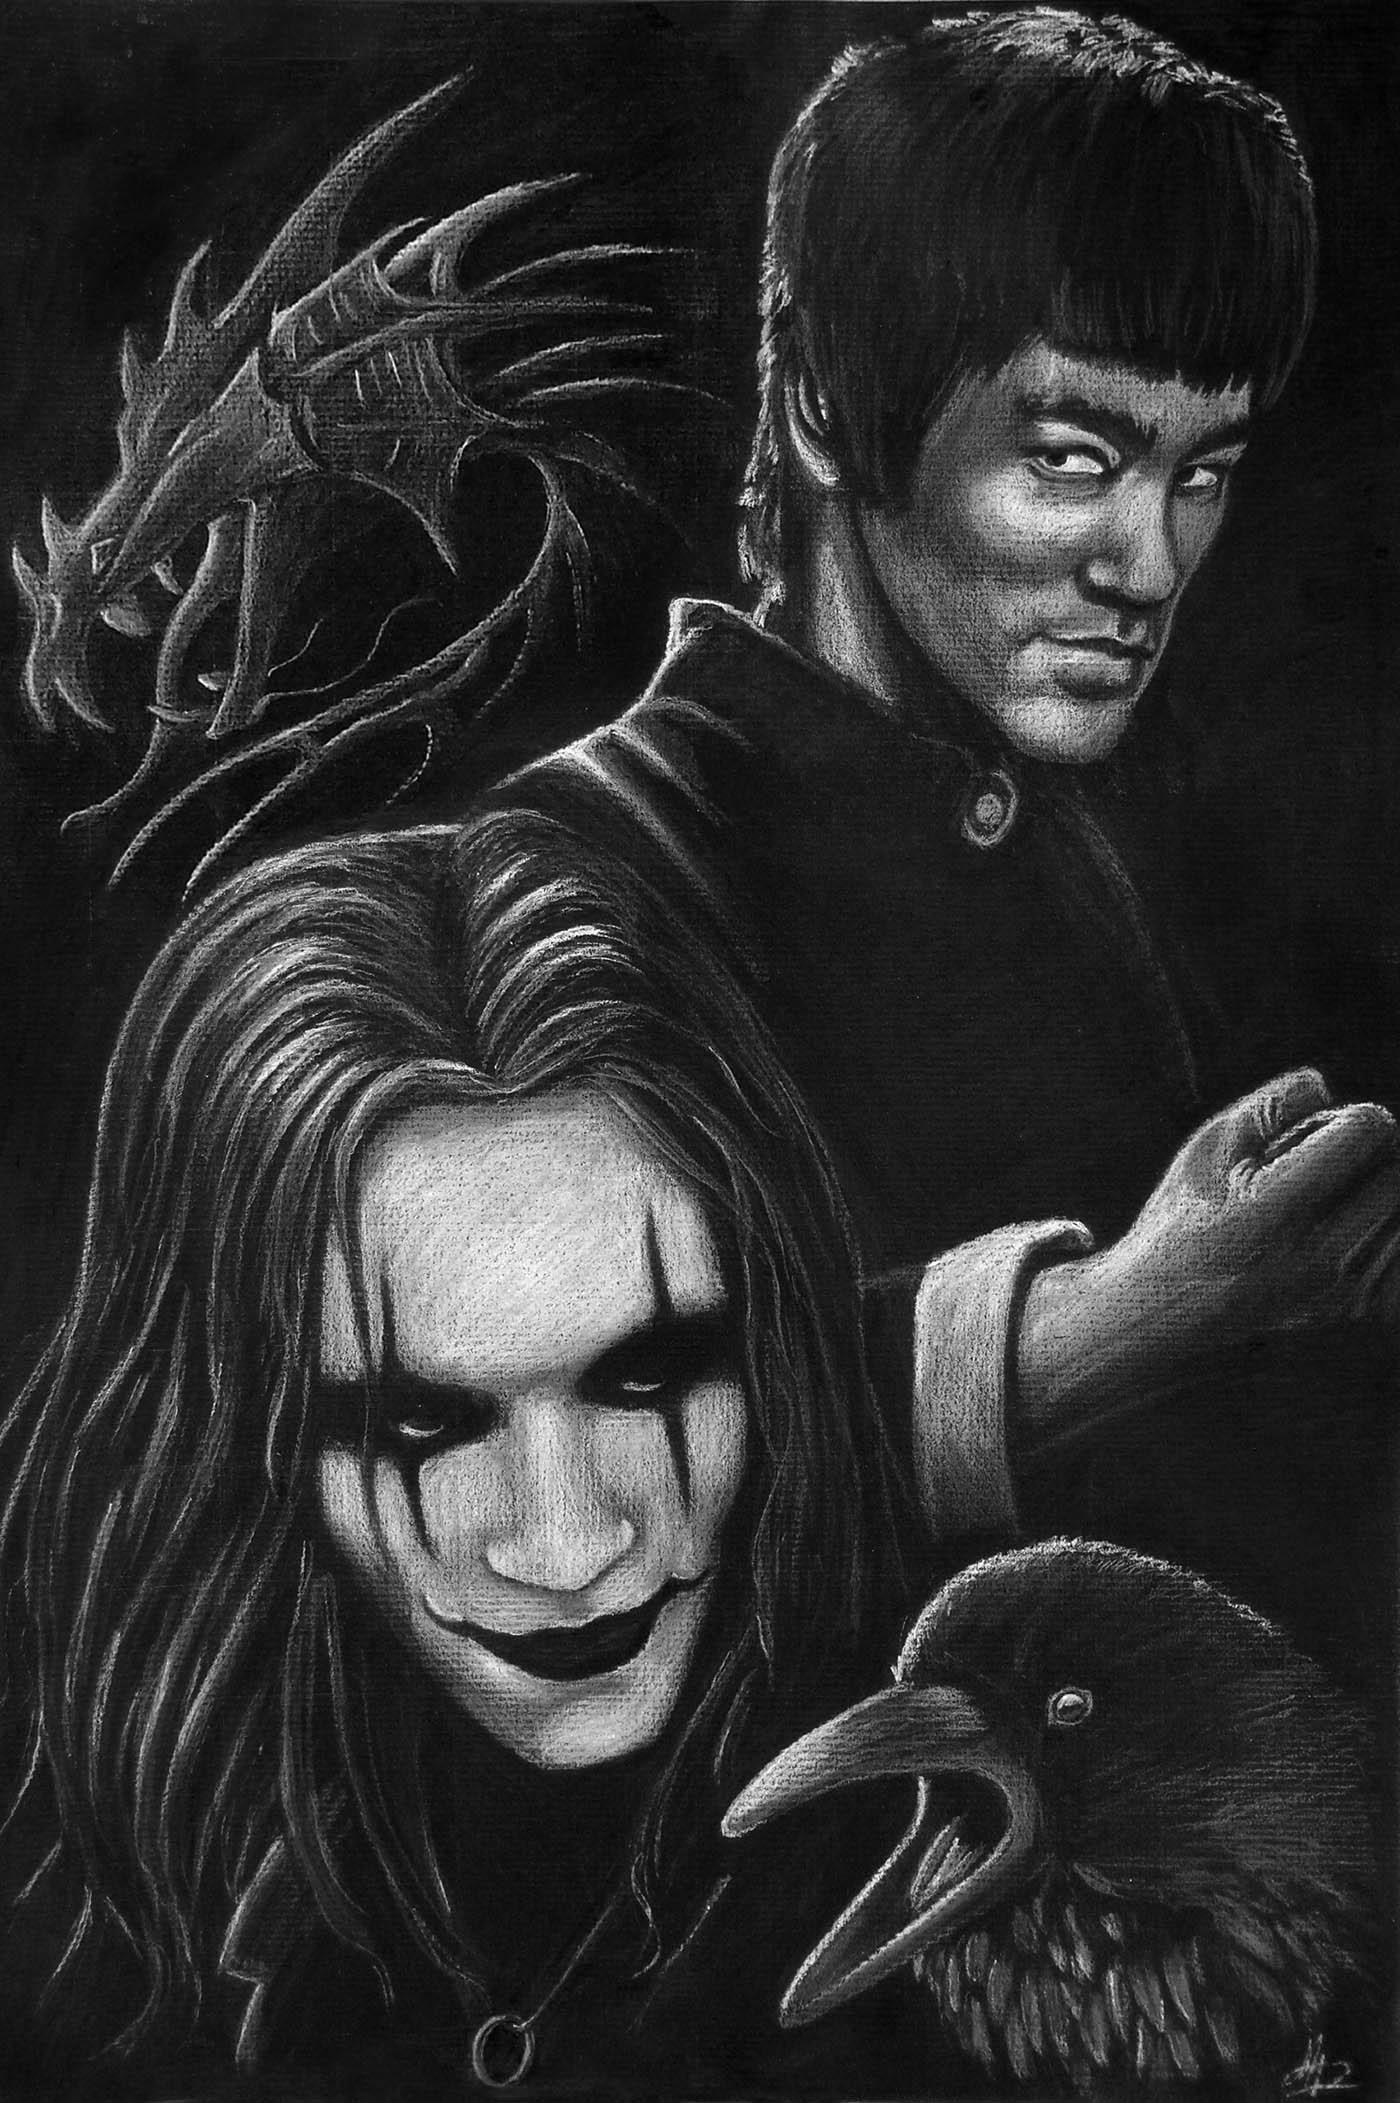 Brandon Lee/Bruce Lee/Crow/The Dragon